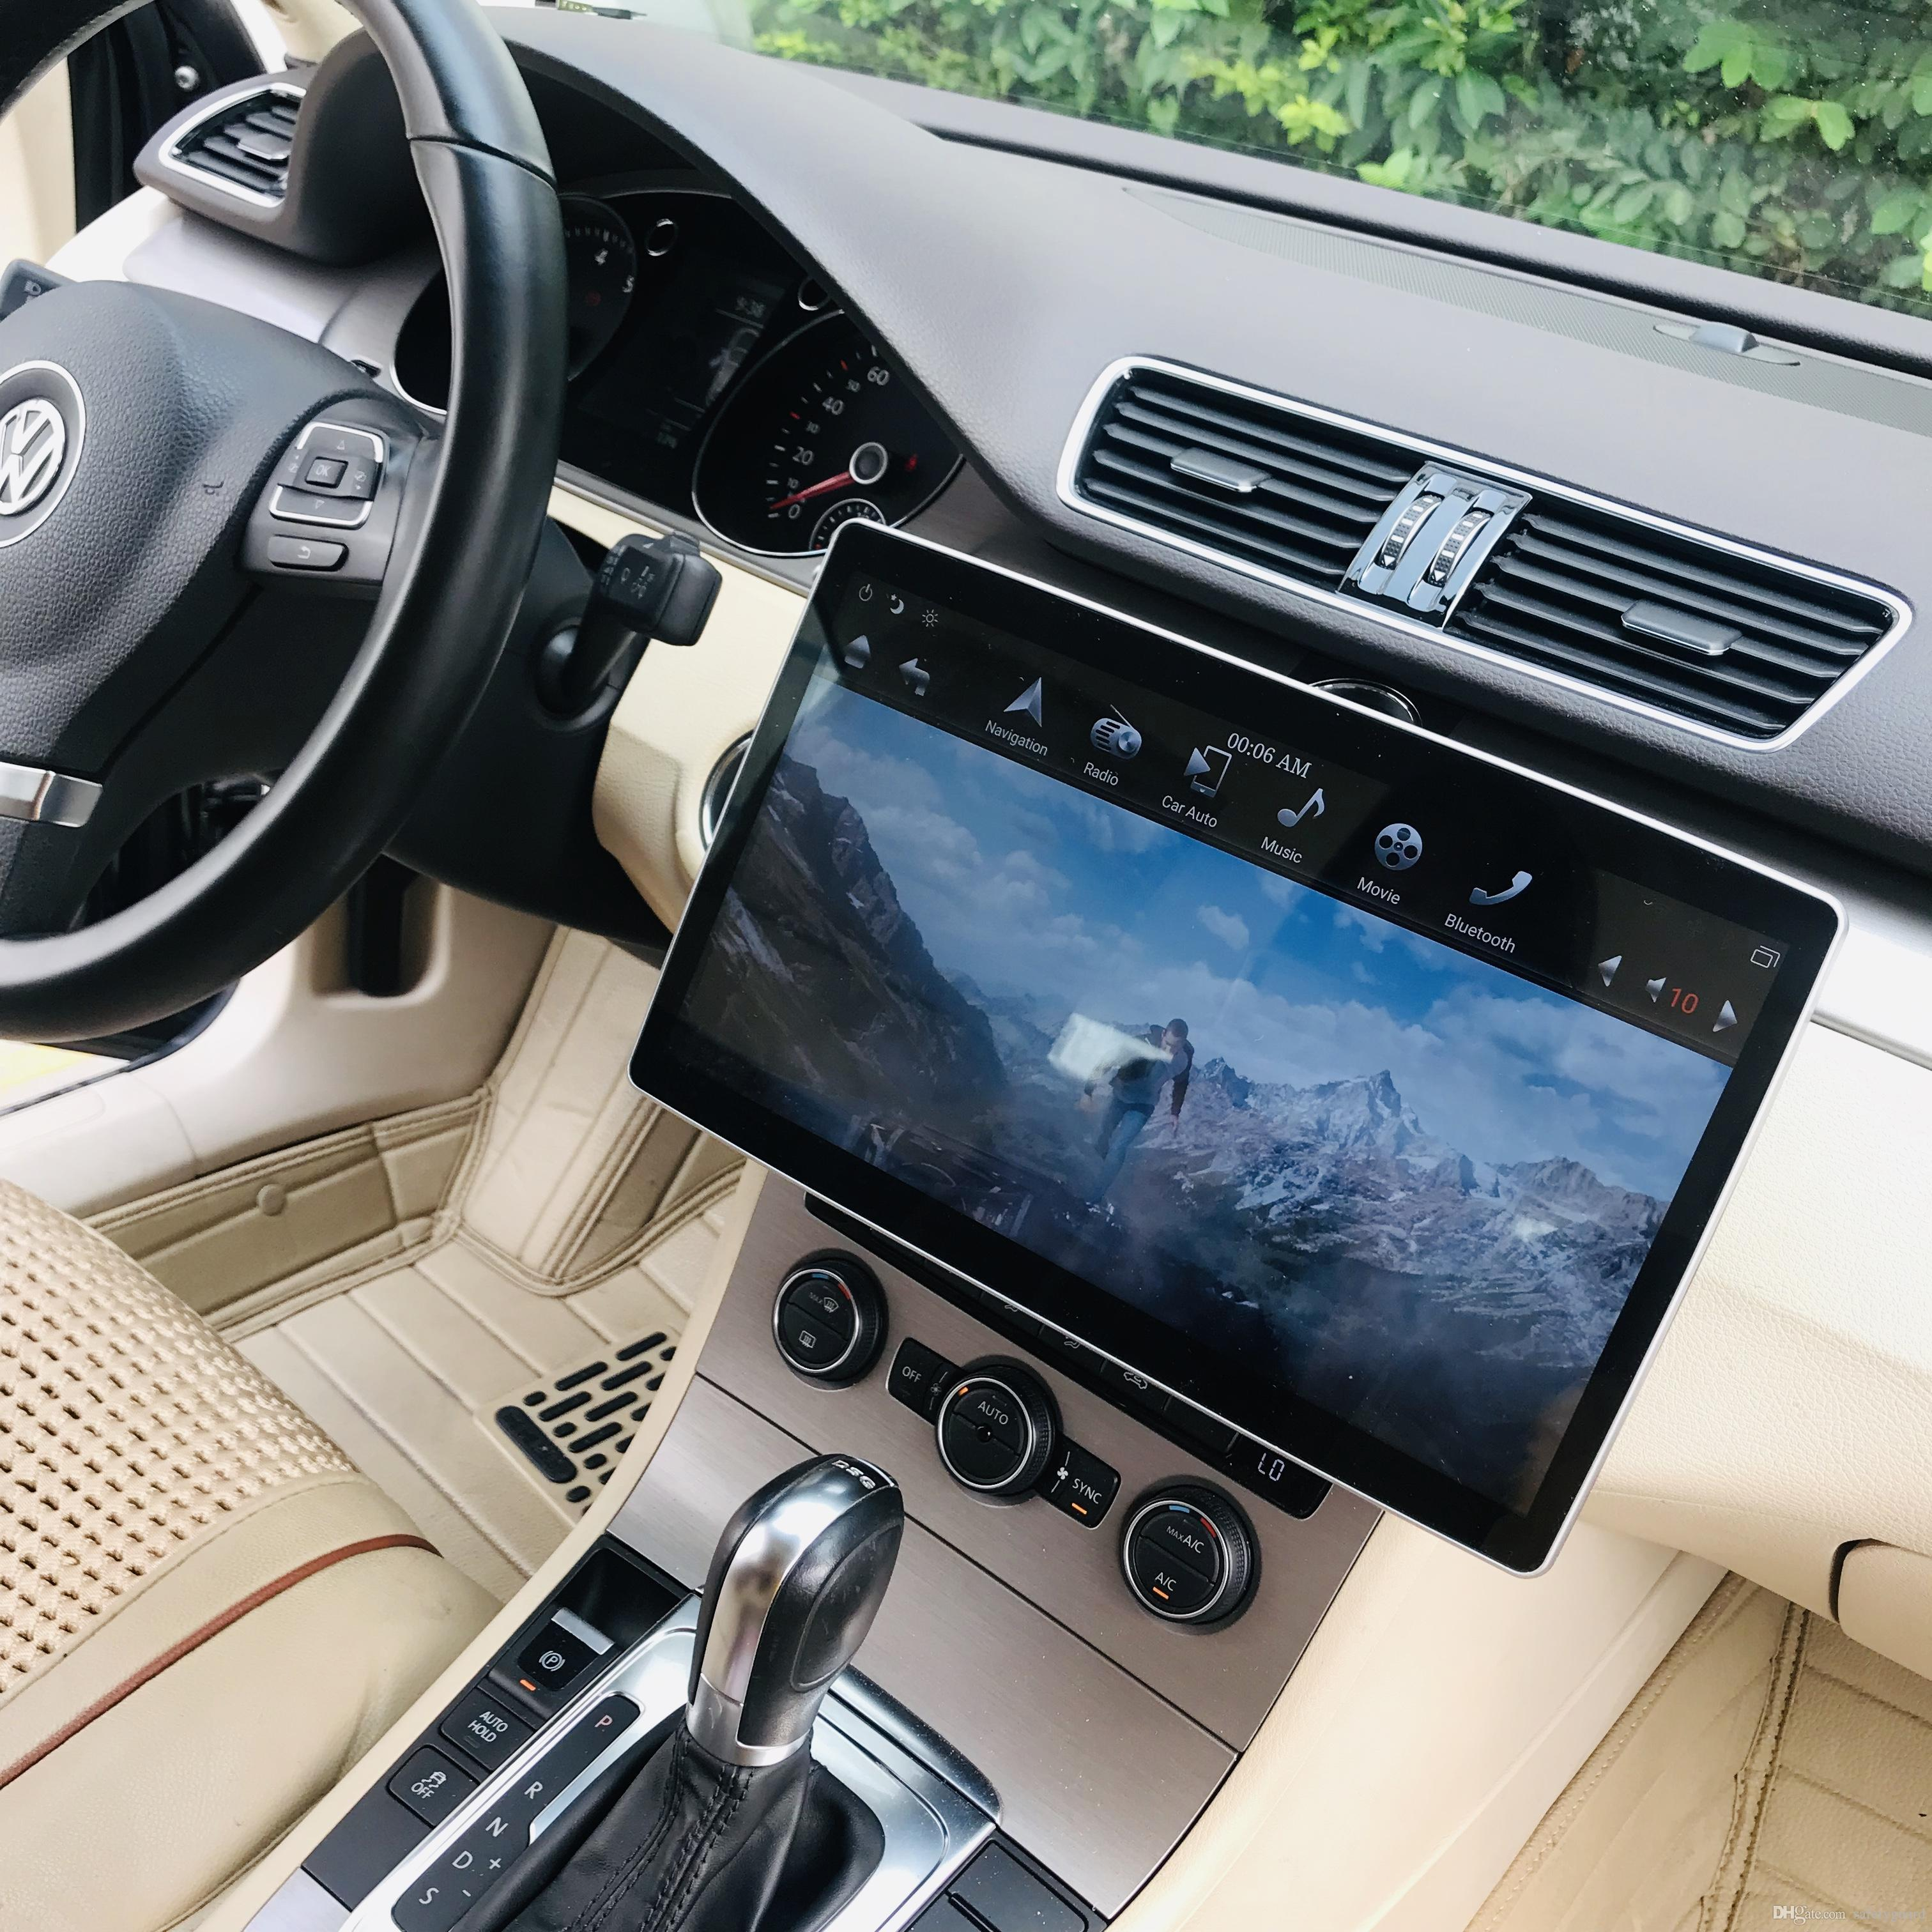 "IPS rotativo 2 DIN 12.8"" 6-Core PX6 Android 8.1 dvd del coche universal jugador de radio del GPS Bluetooth WIFI de fácil conexión a IPS pantalla giratoria"